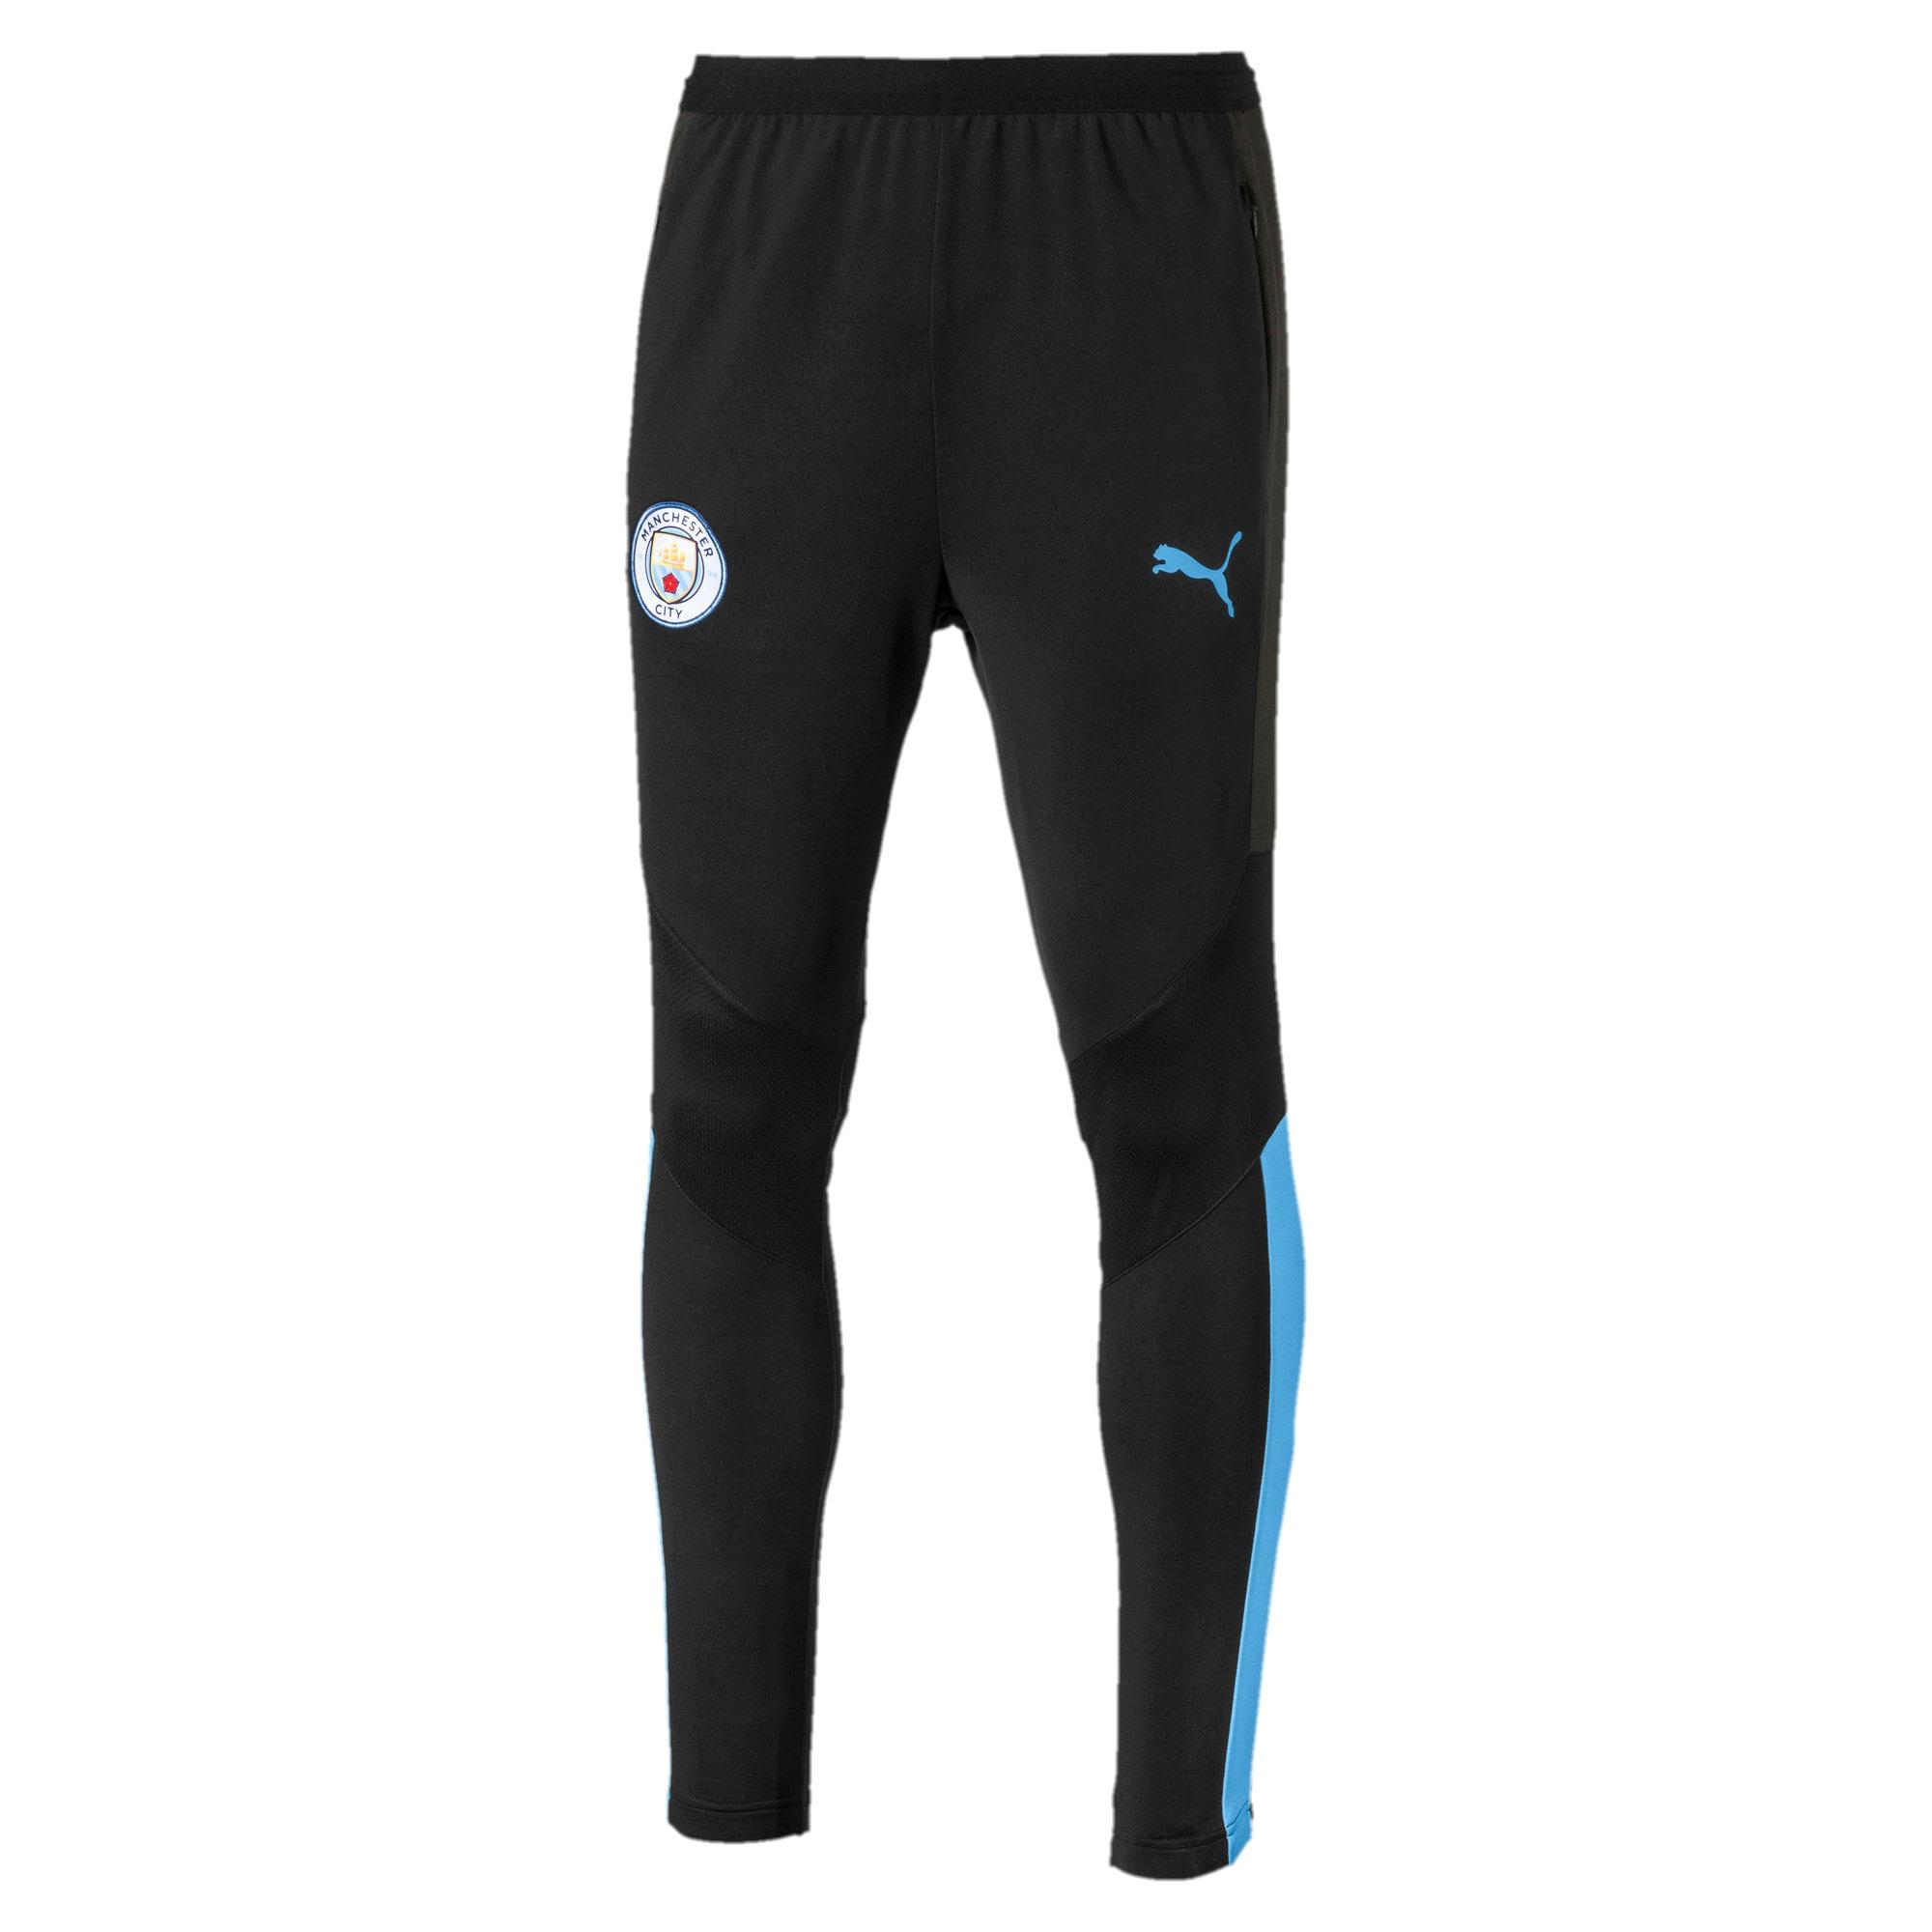 Thumbnail 1 of Manchester City FC Pro trainingsbroek voor heren, Puma Black-Team Light Blue, medium